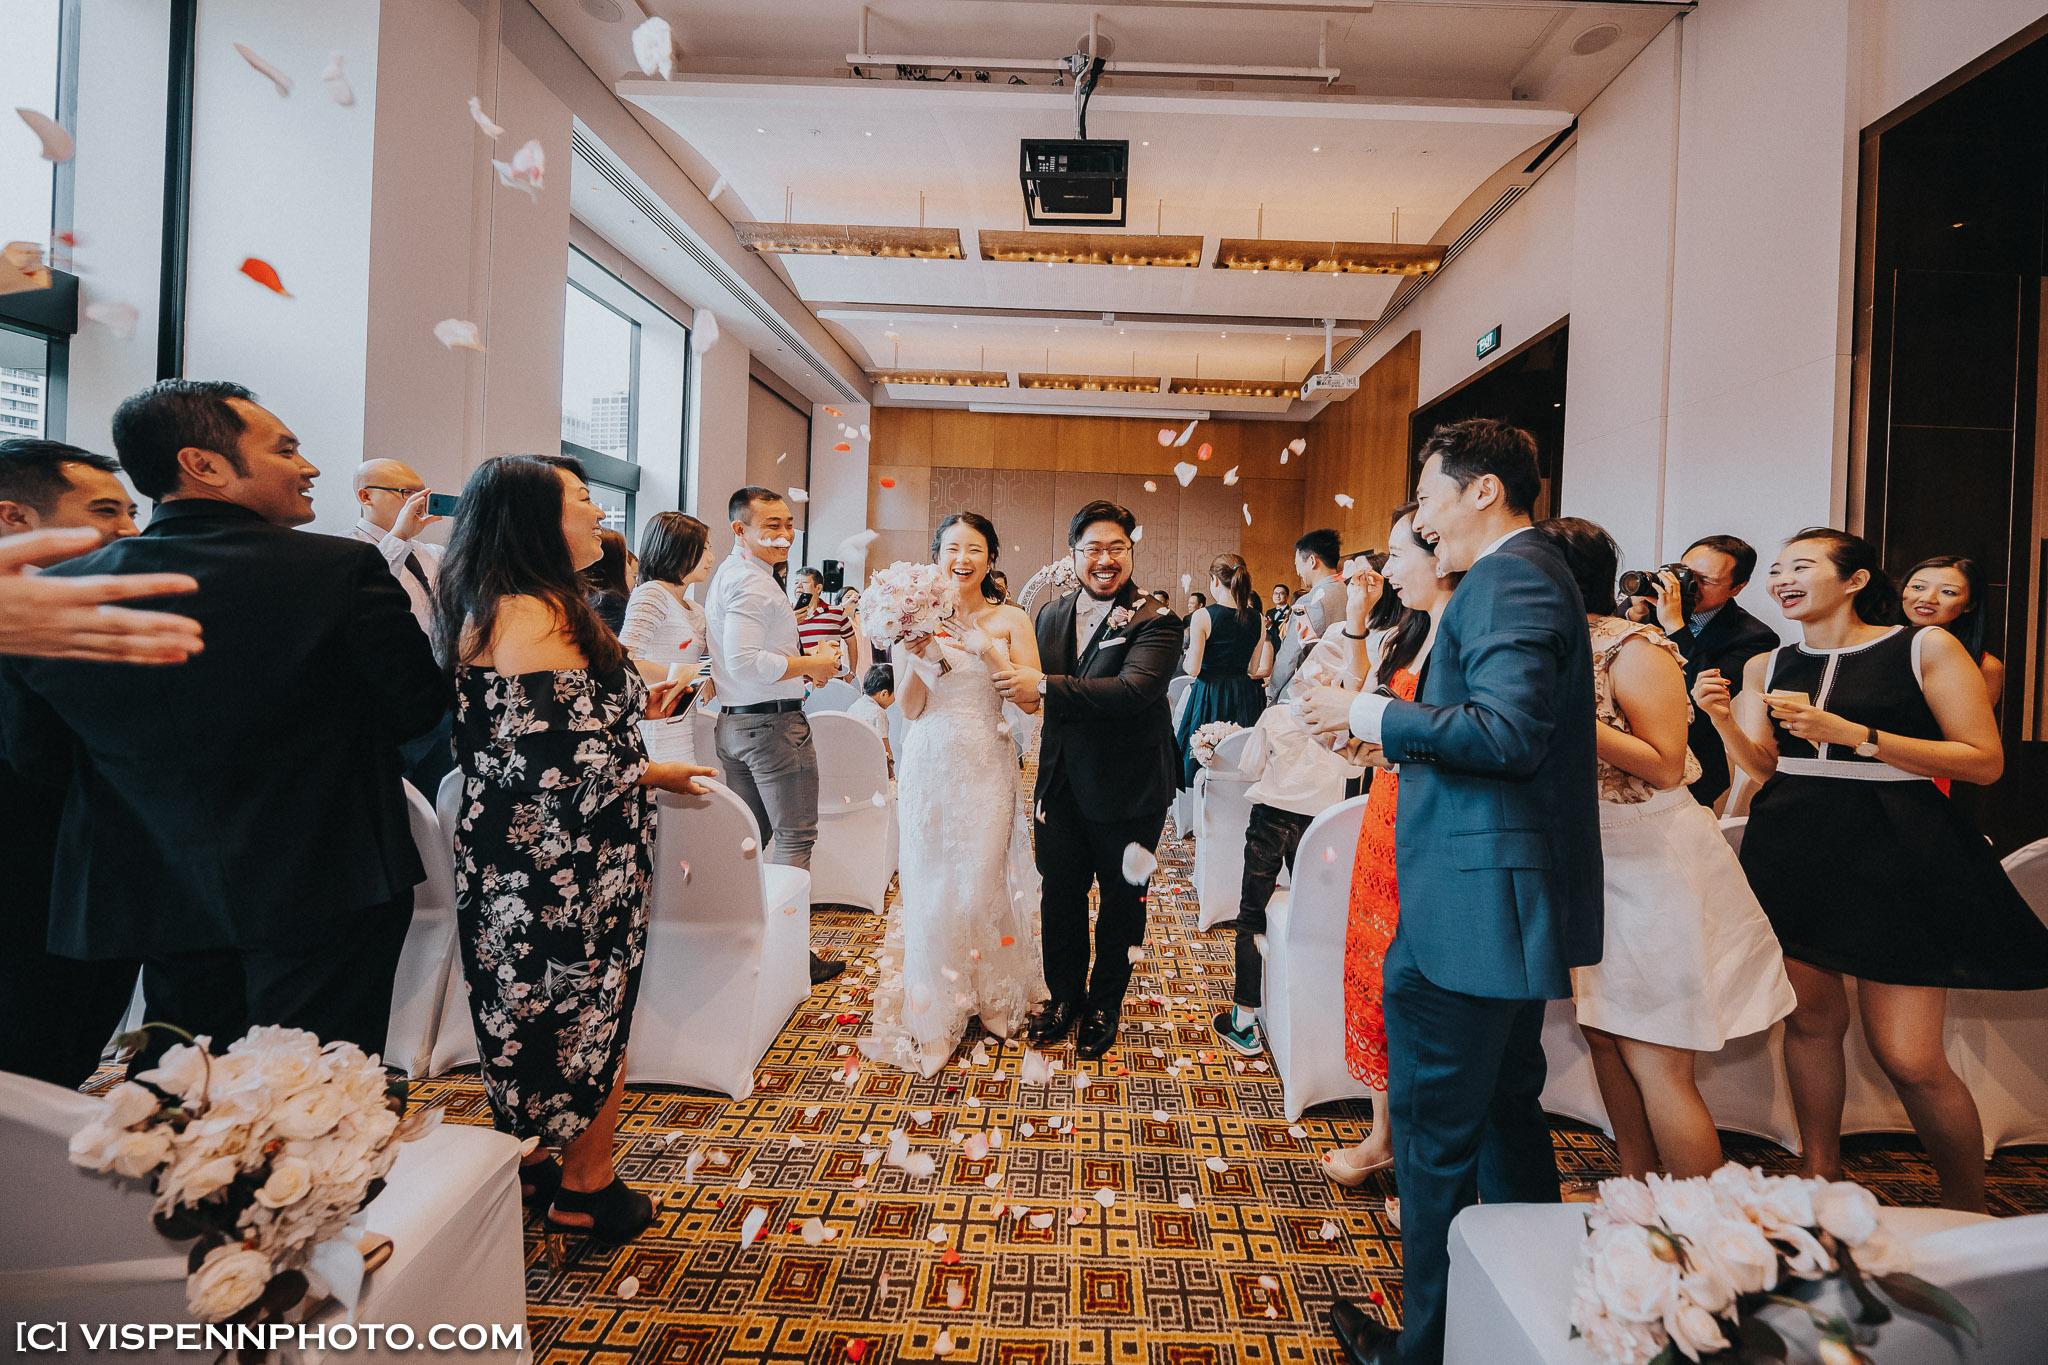 WEDDING DAY Photography Melbourne VISPENN 墨尔本 婚礼跟拍 婚礼摄像 婚礼摄影 结婚照 登记照 5D4 0516